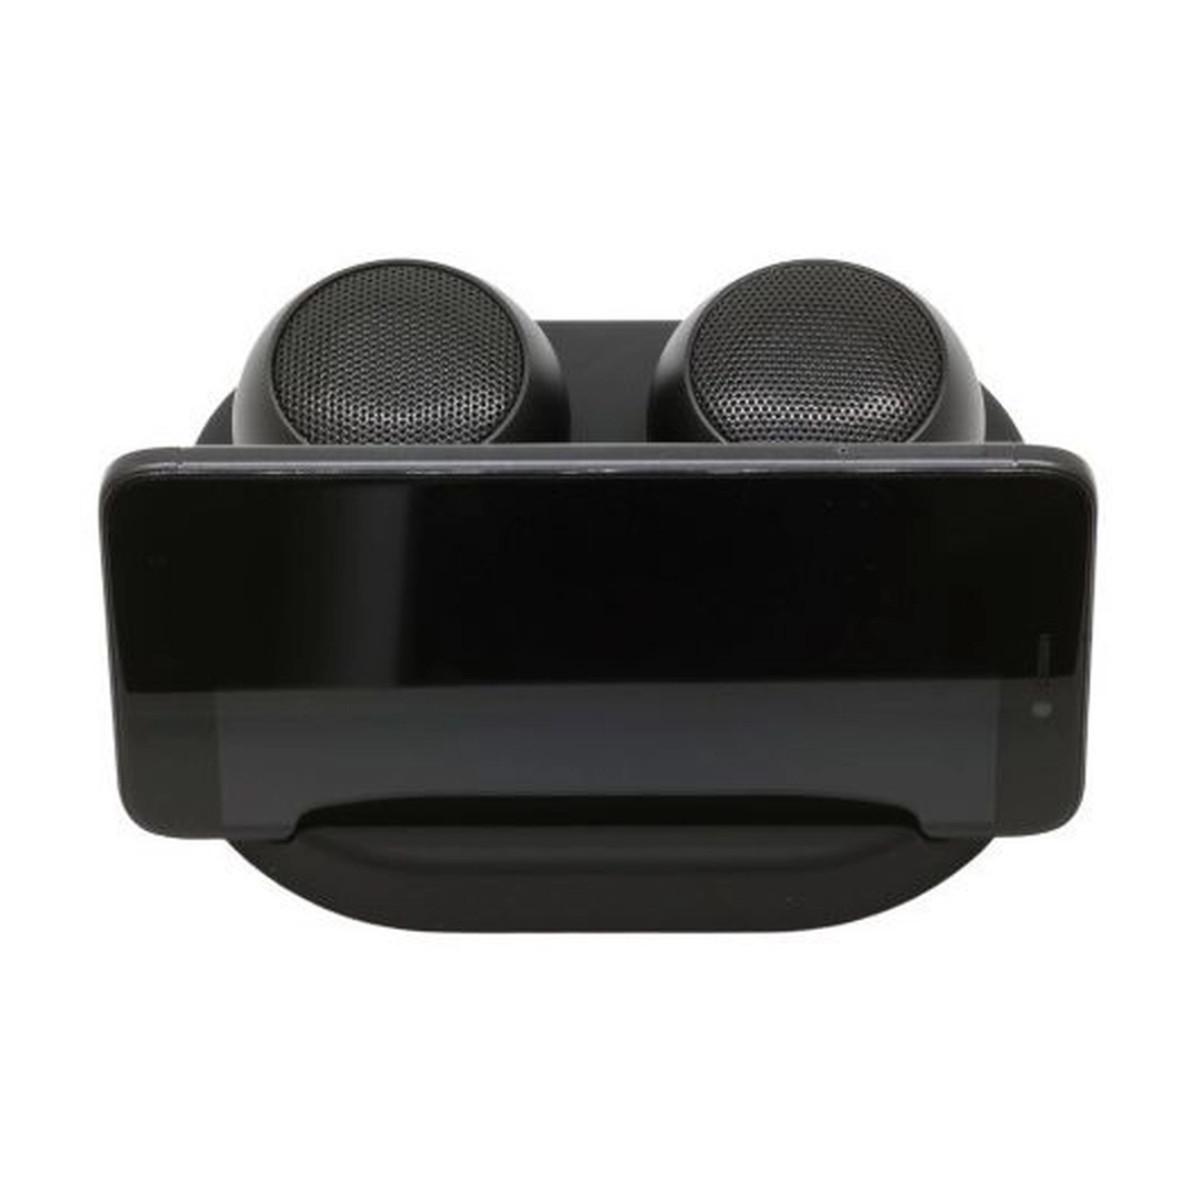 Mini Caixa De Som Gêmeas Speaker YX-K1